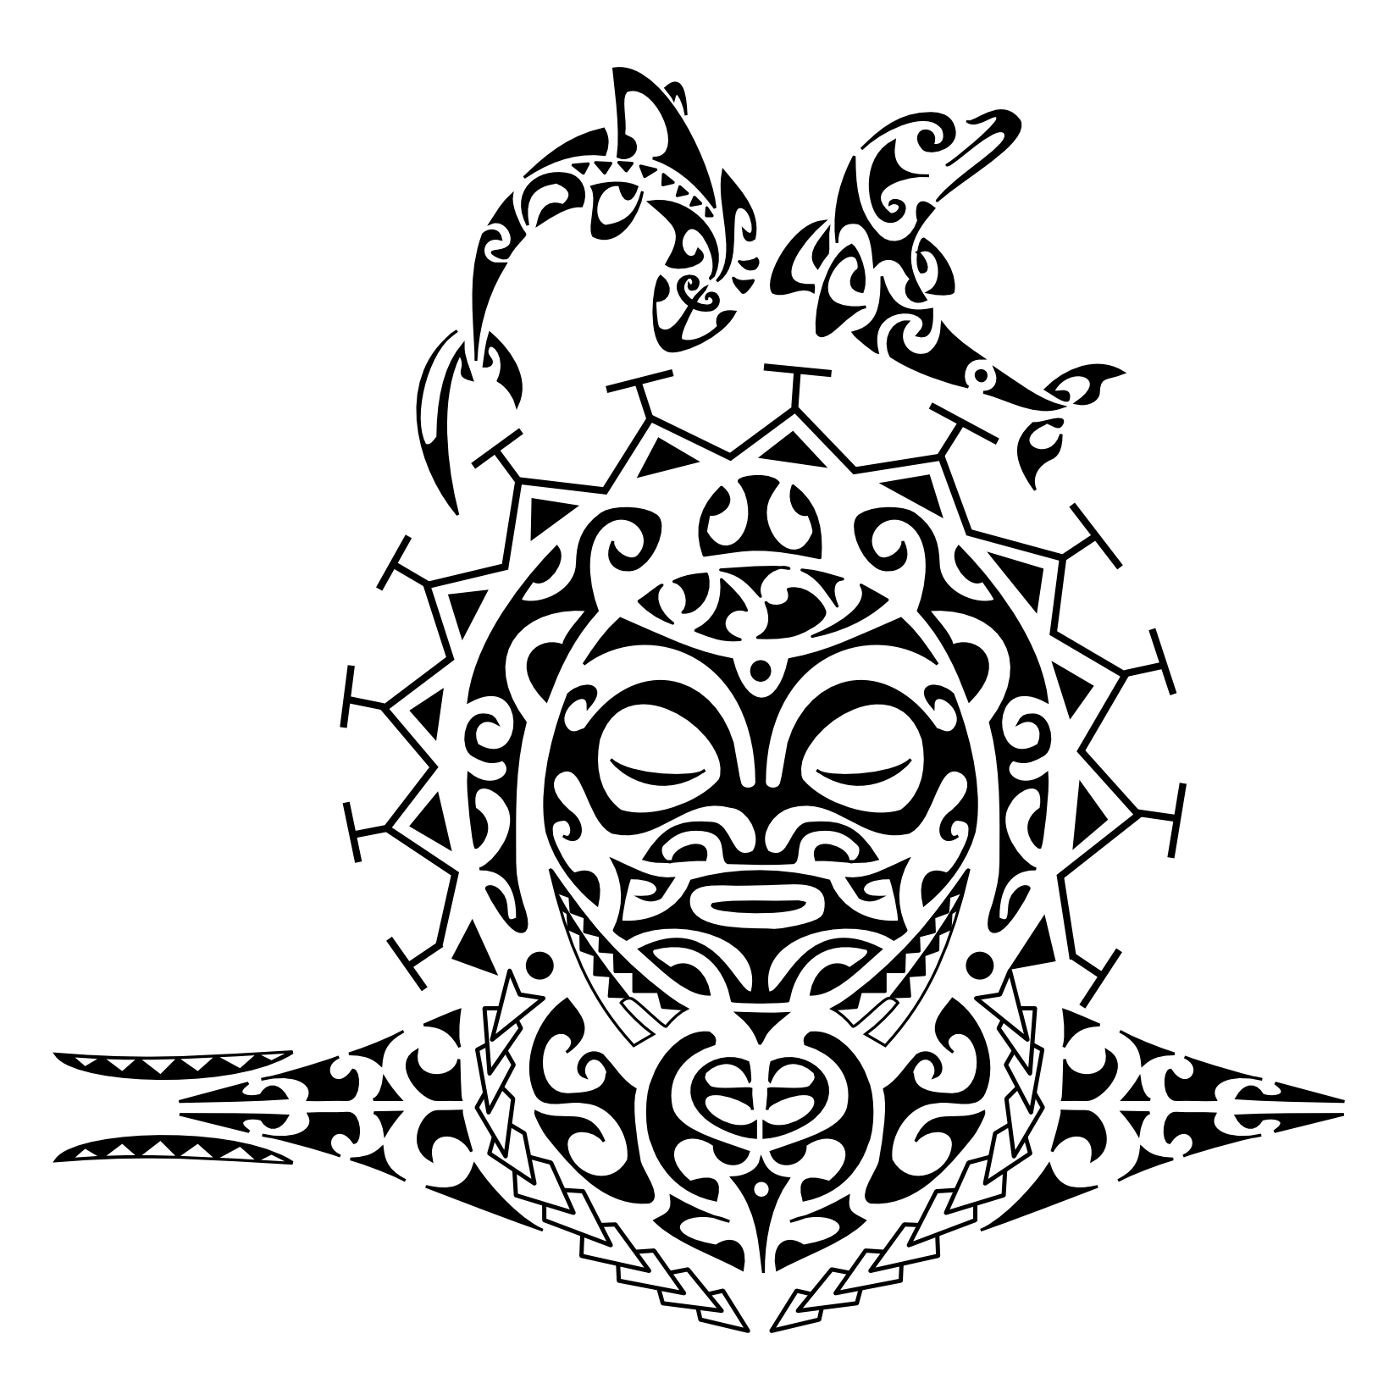 Blu sky tattoo studio maori significato 67 for Tattoo simboli di vita